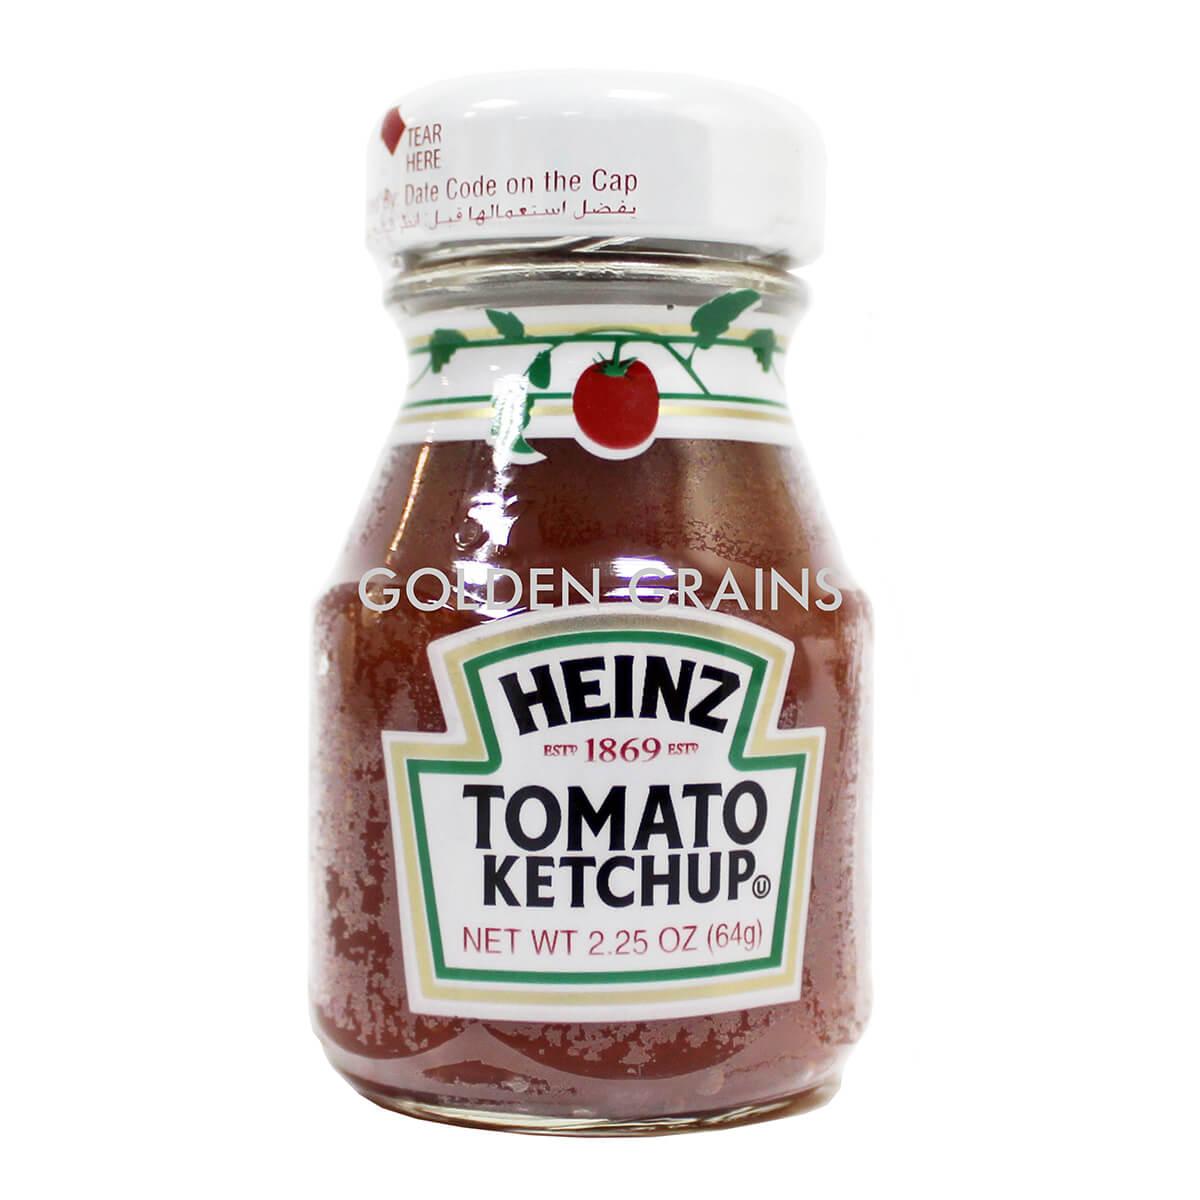 Golden Grains Dubai Export - Heinz Ketchup Mini - Front.jpg